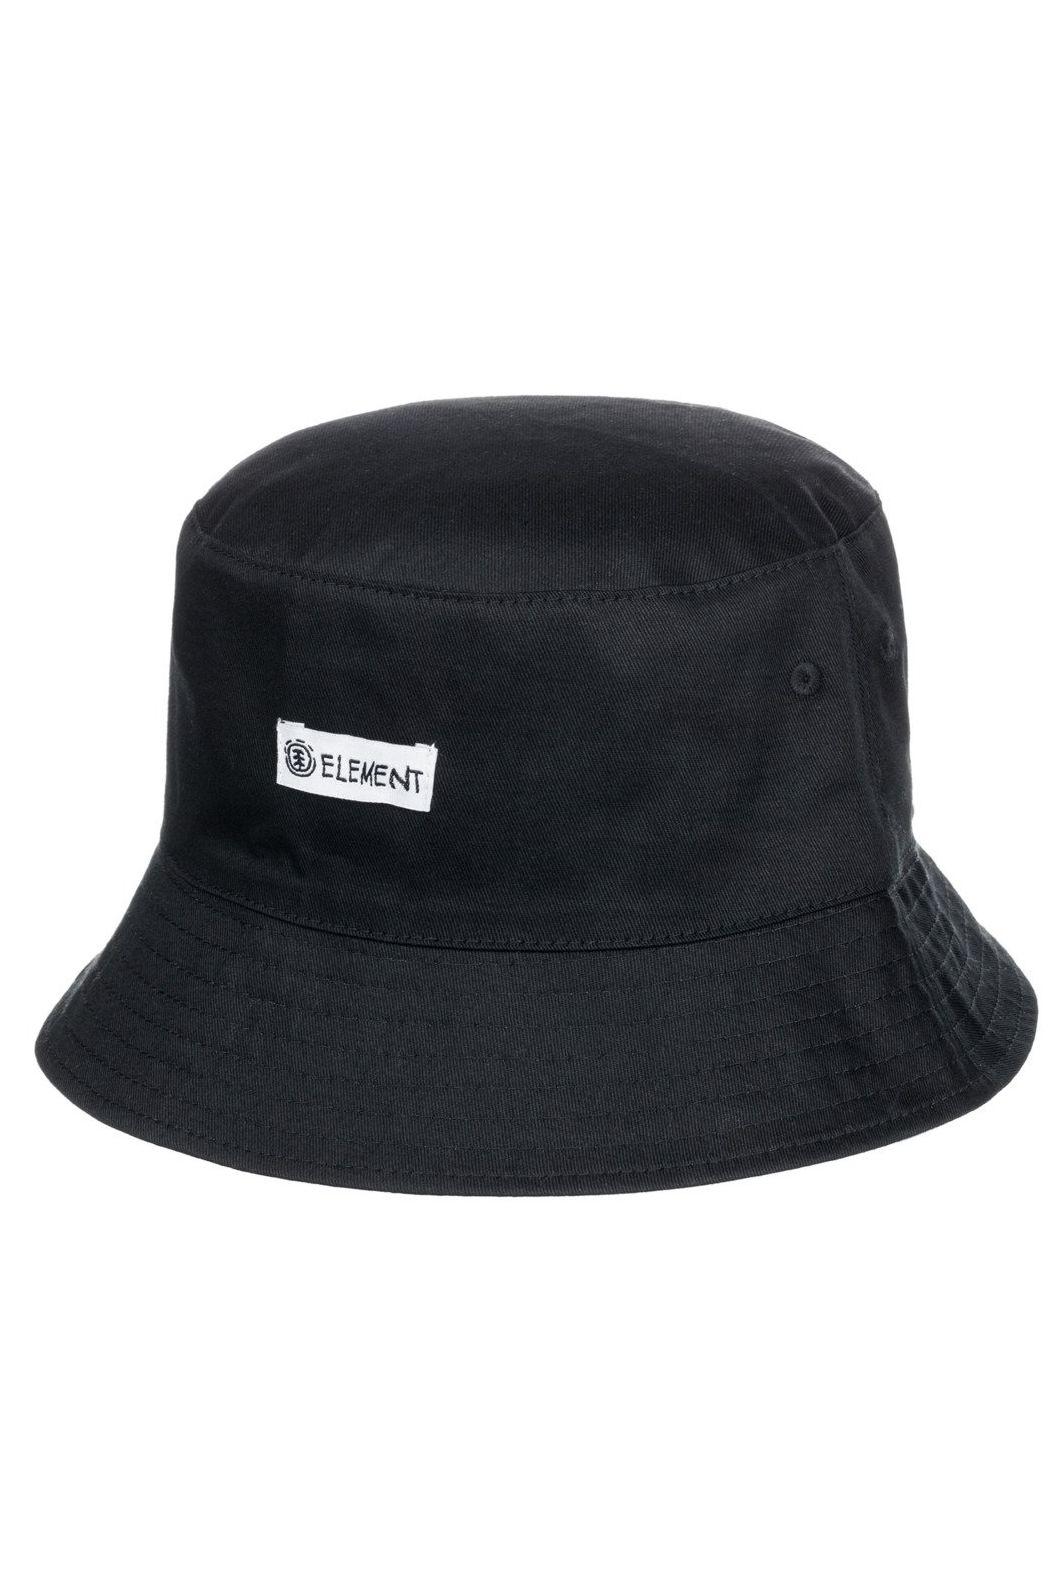 Element Cap SHROOMS BUCKET HAT SHROOMS PACK Flint Black